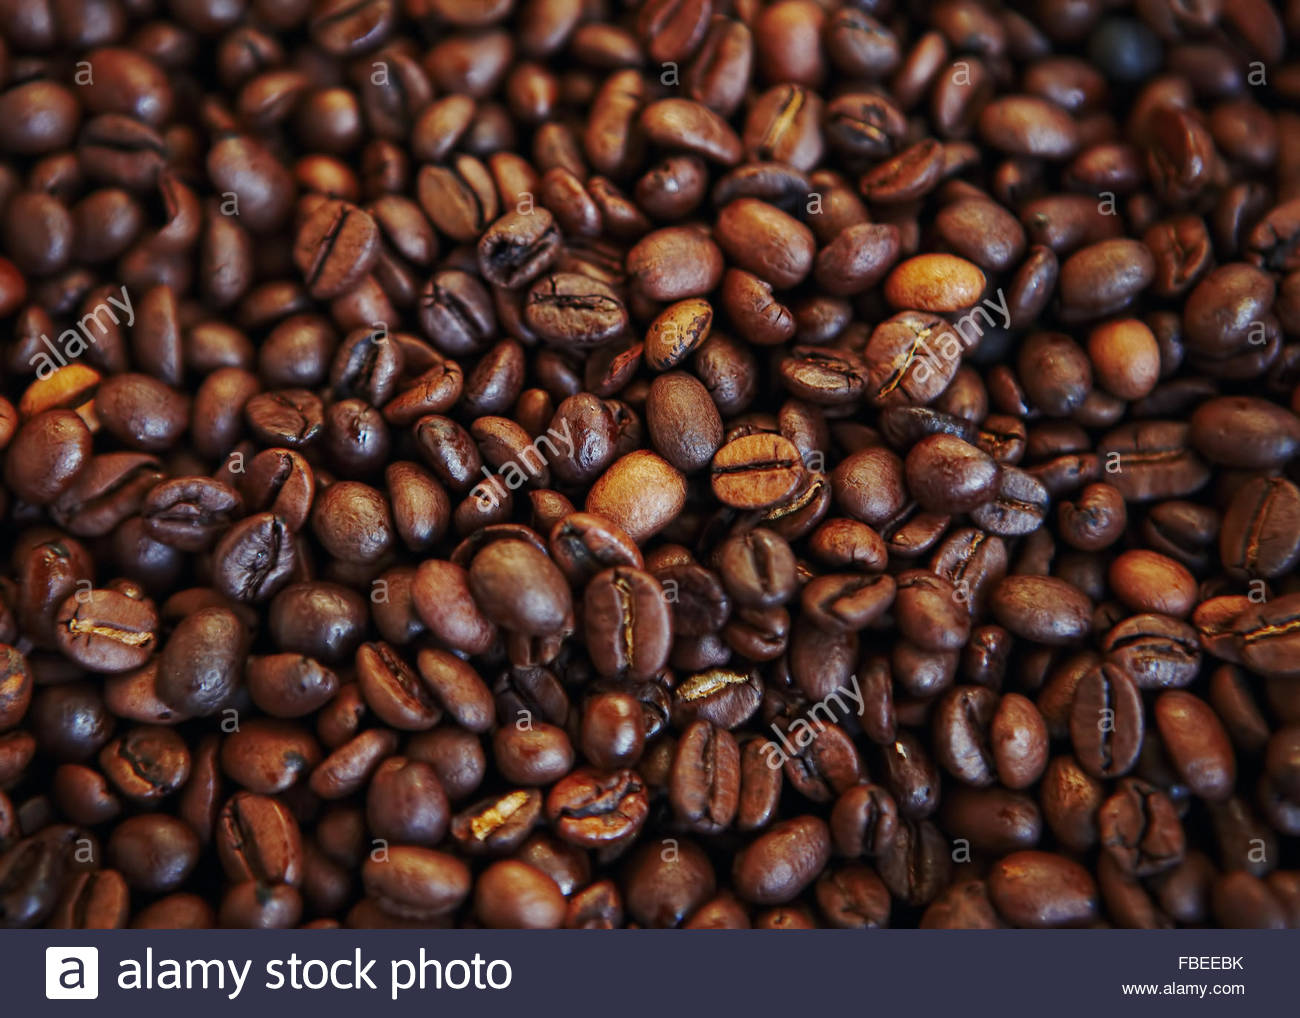 Roasted coffee bean pile - Stock Image